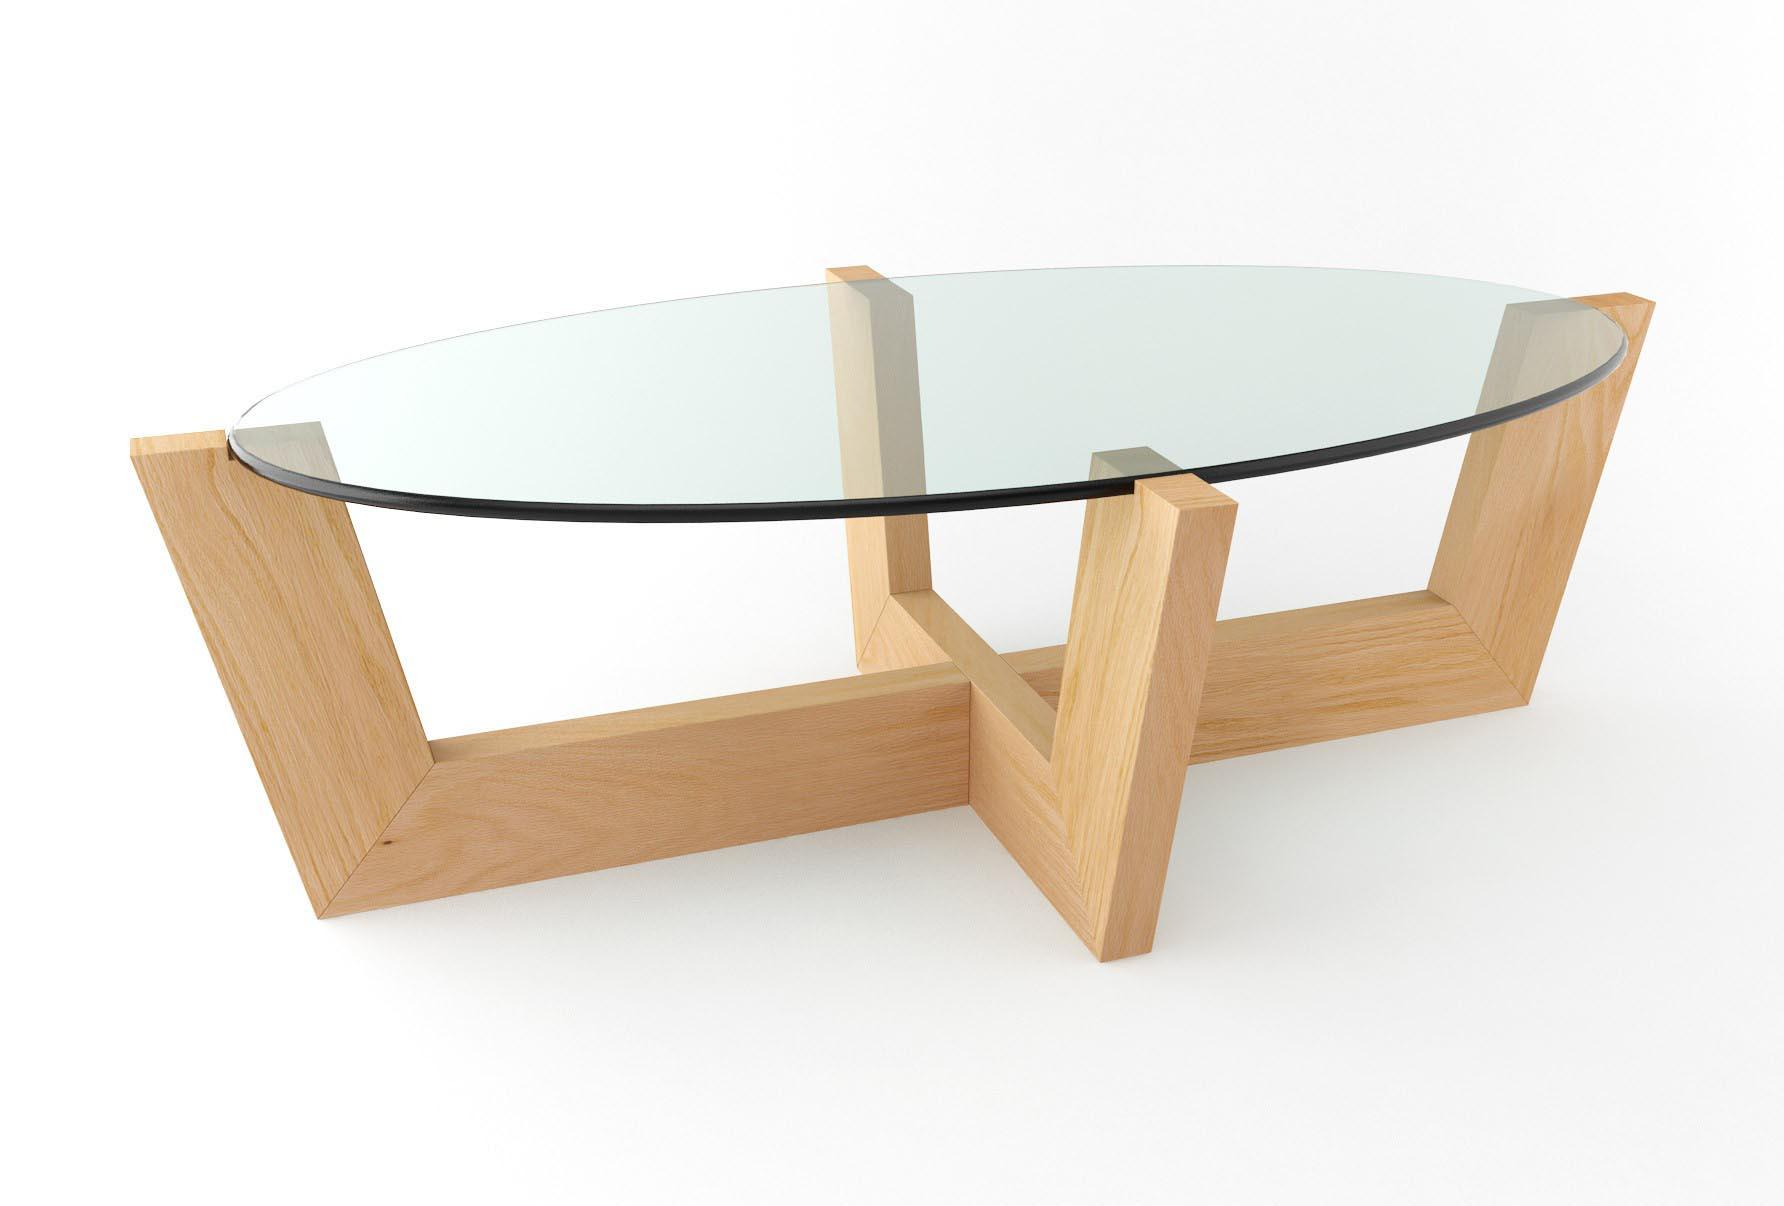 wood coffee table base photo - 8